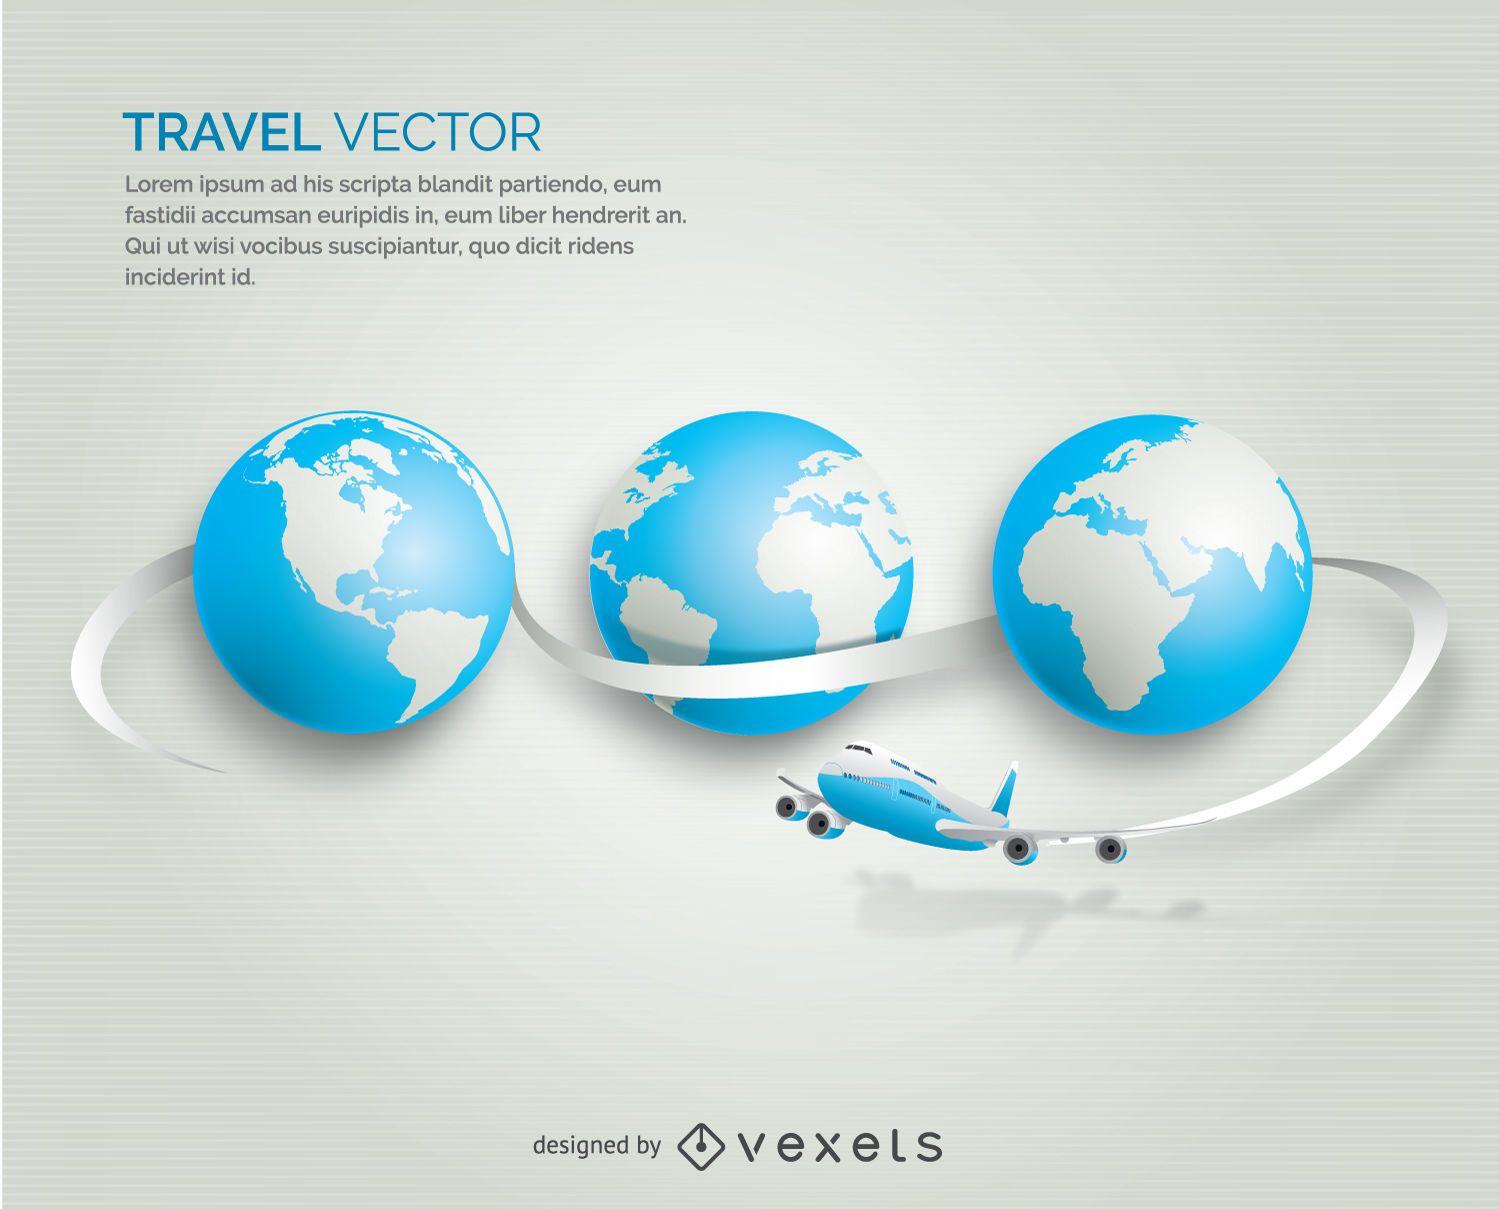 Airplane traveling globe